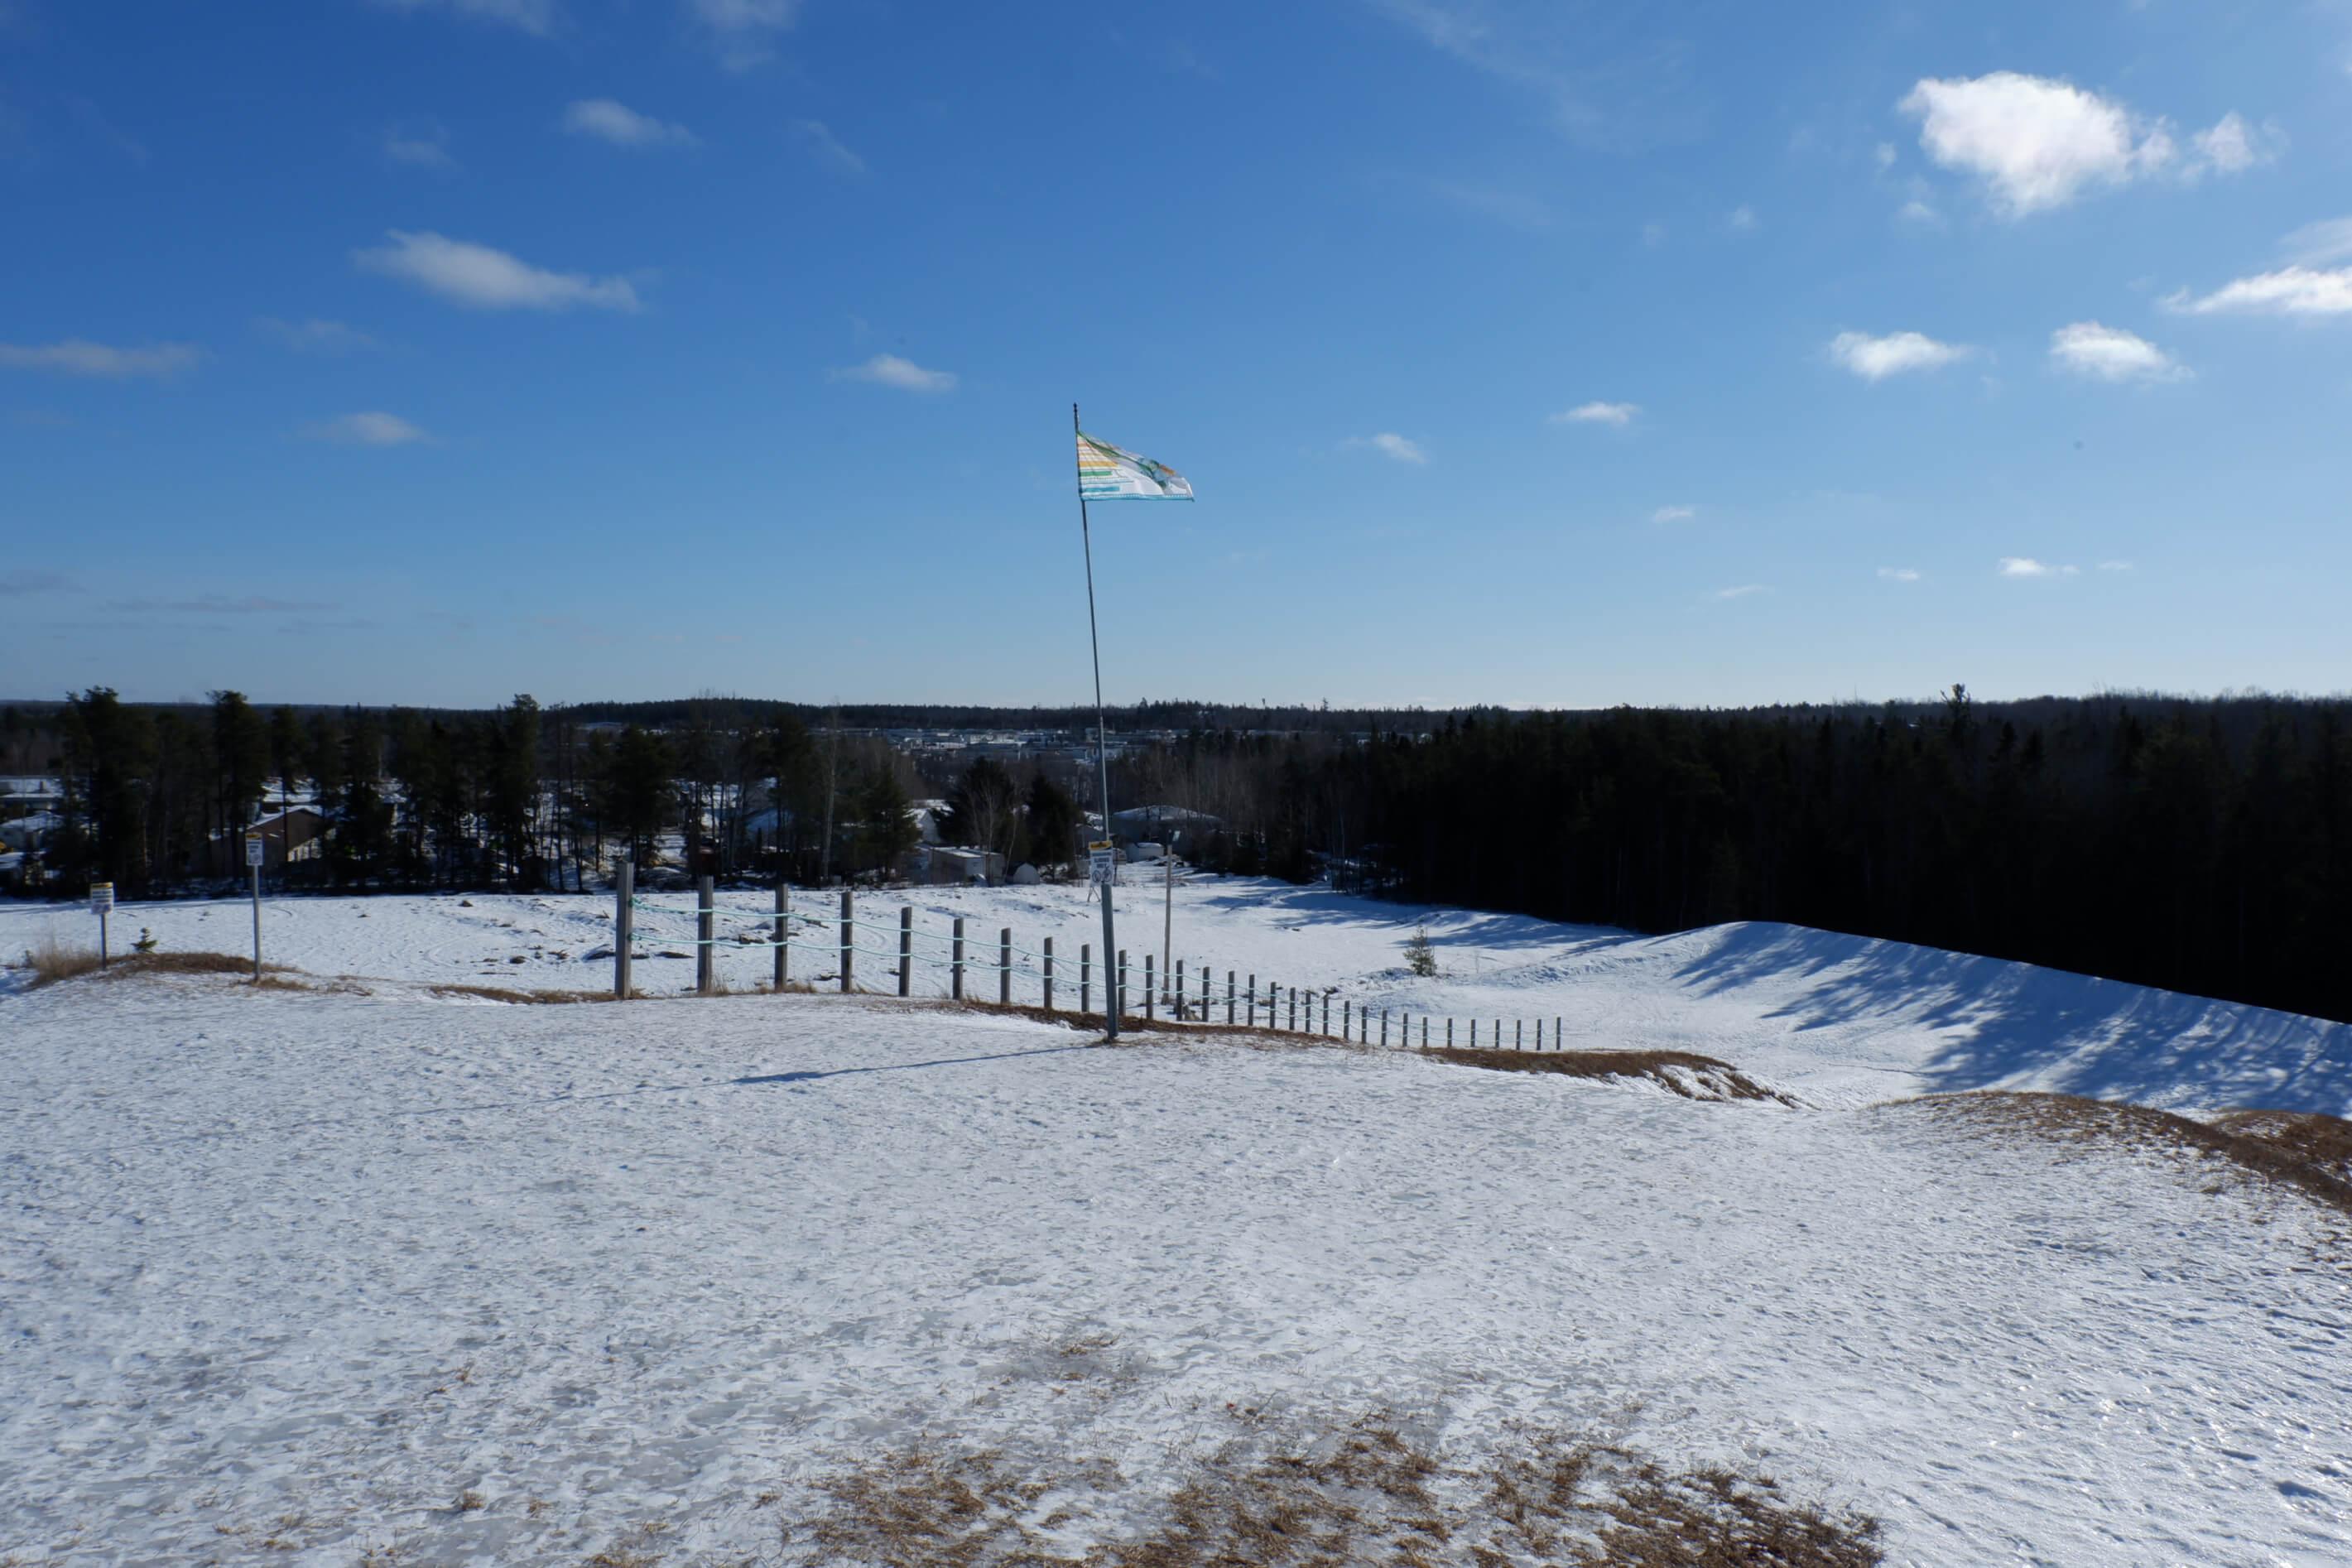 sliding hill riverview winter wonderland park